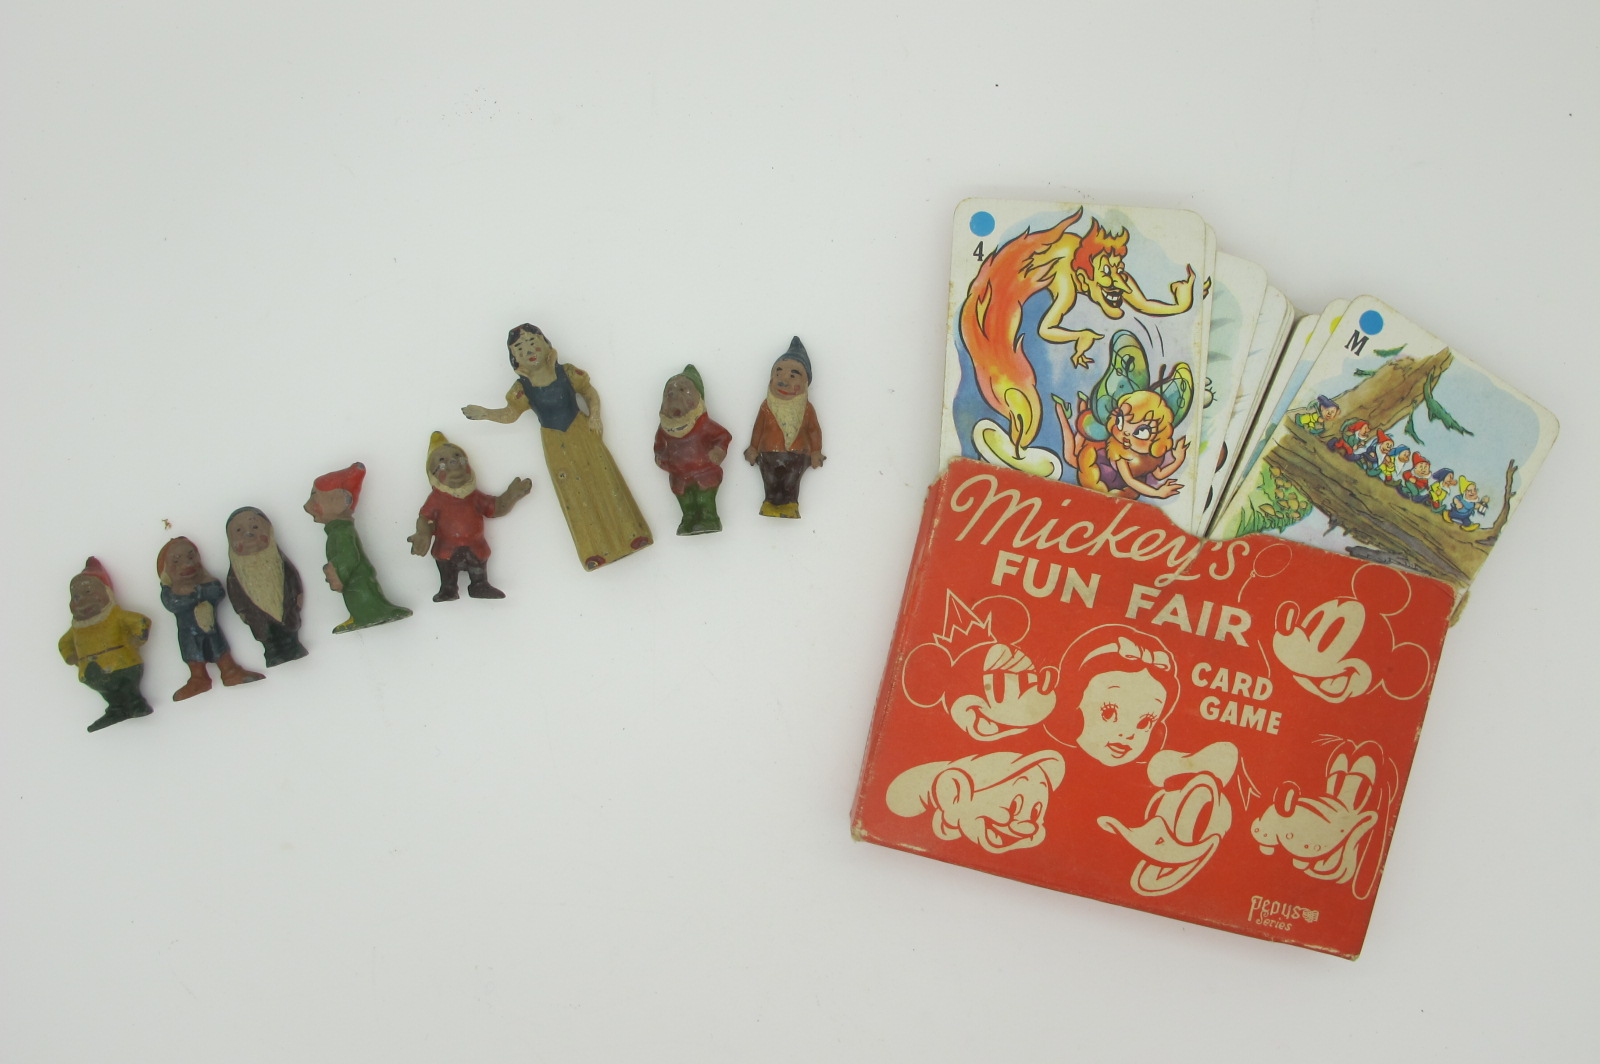 A Pre War Britains Snow White and Seven Dwarfs, appears unbroken, plus a 'Pepys' Mickeys Fun Fair